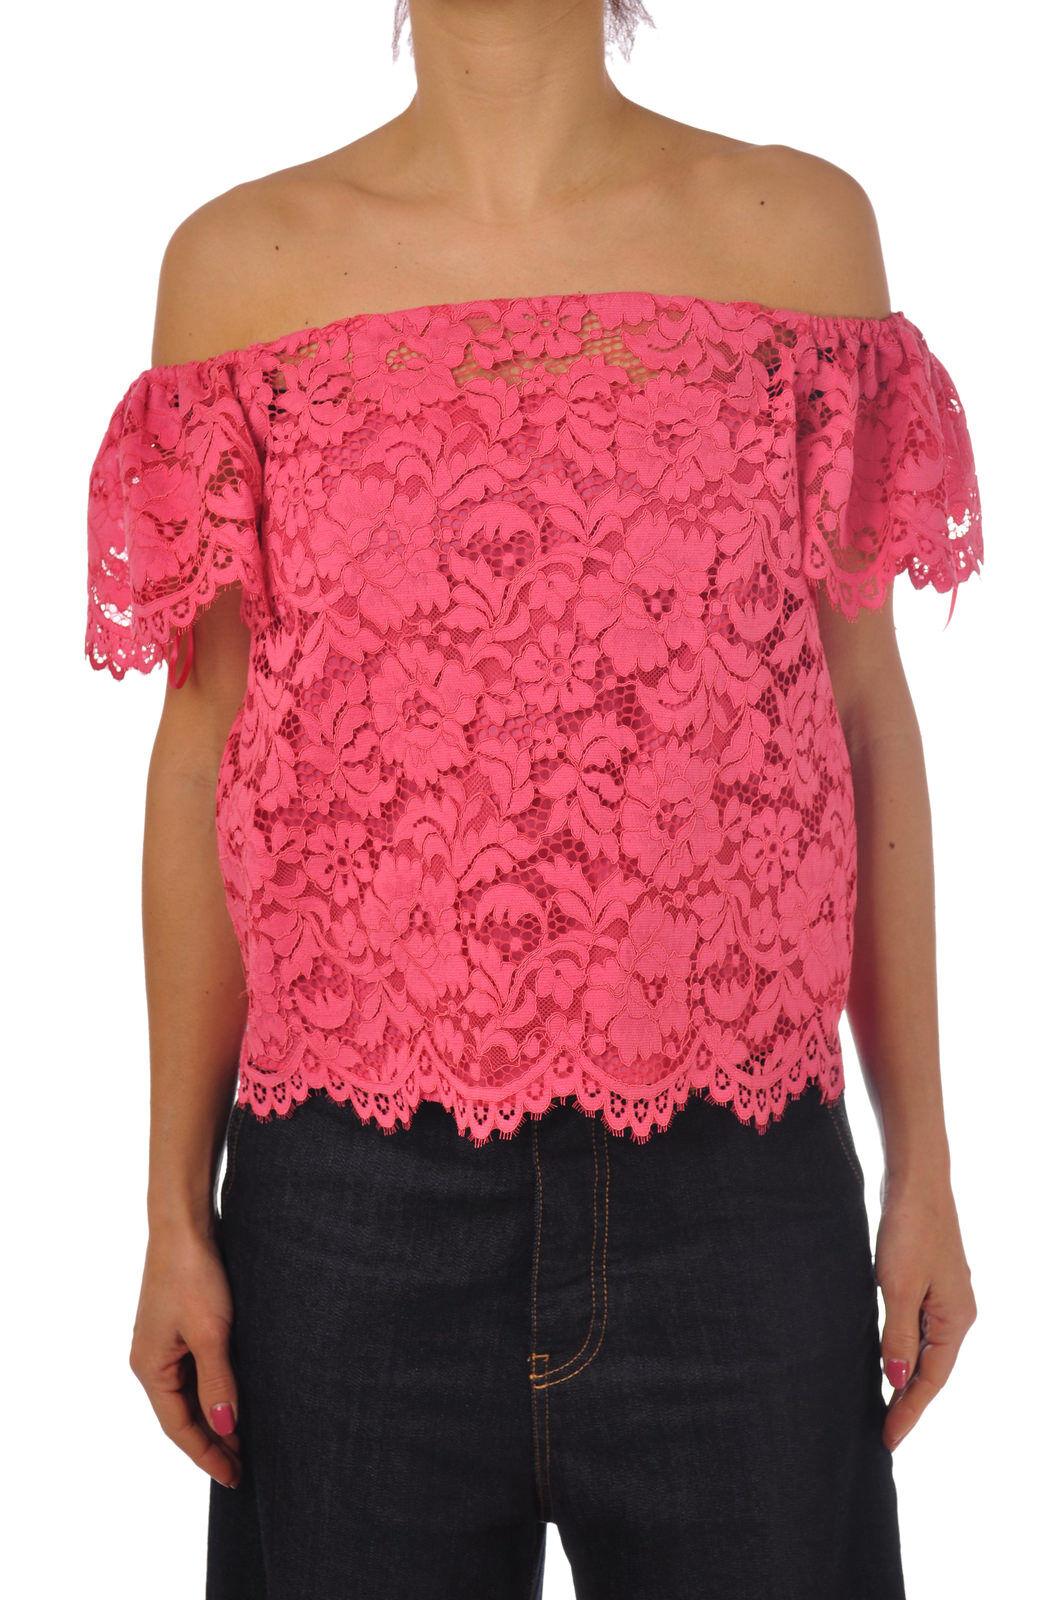 Twin Set - Shirts-Blouses - Woman - Pink - 5108126F184611